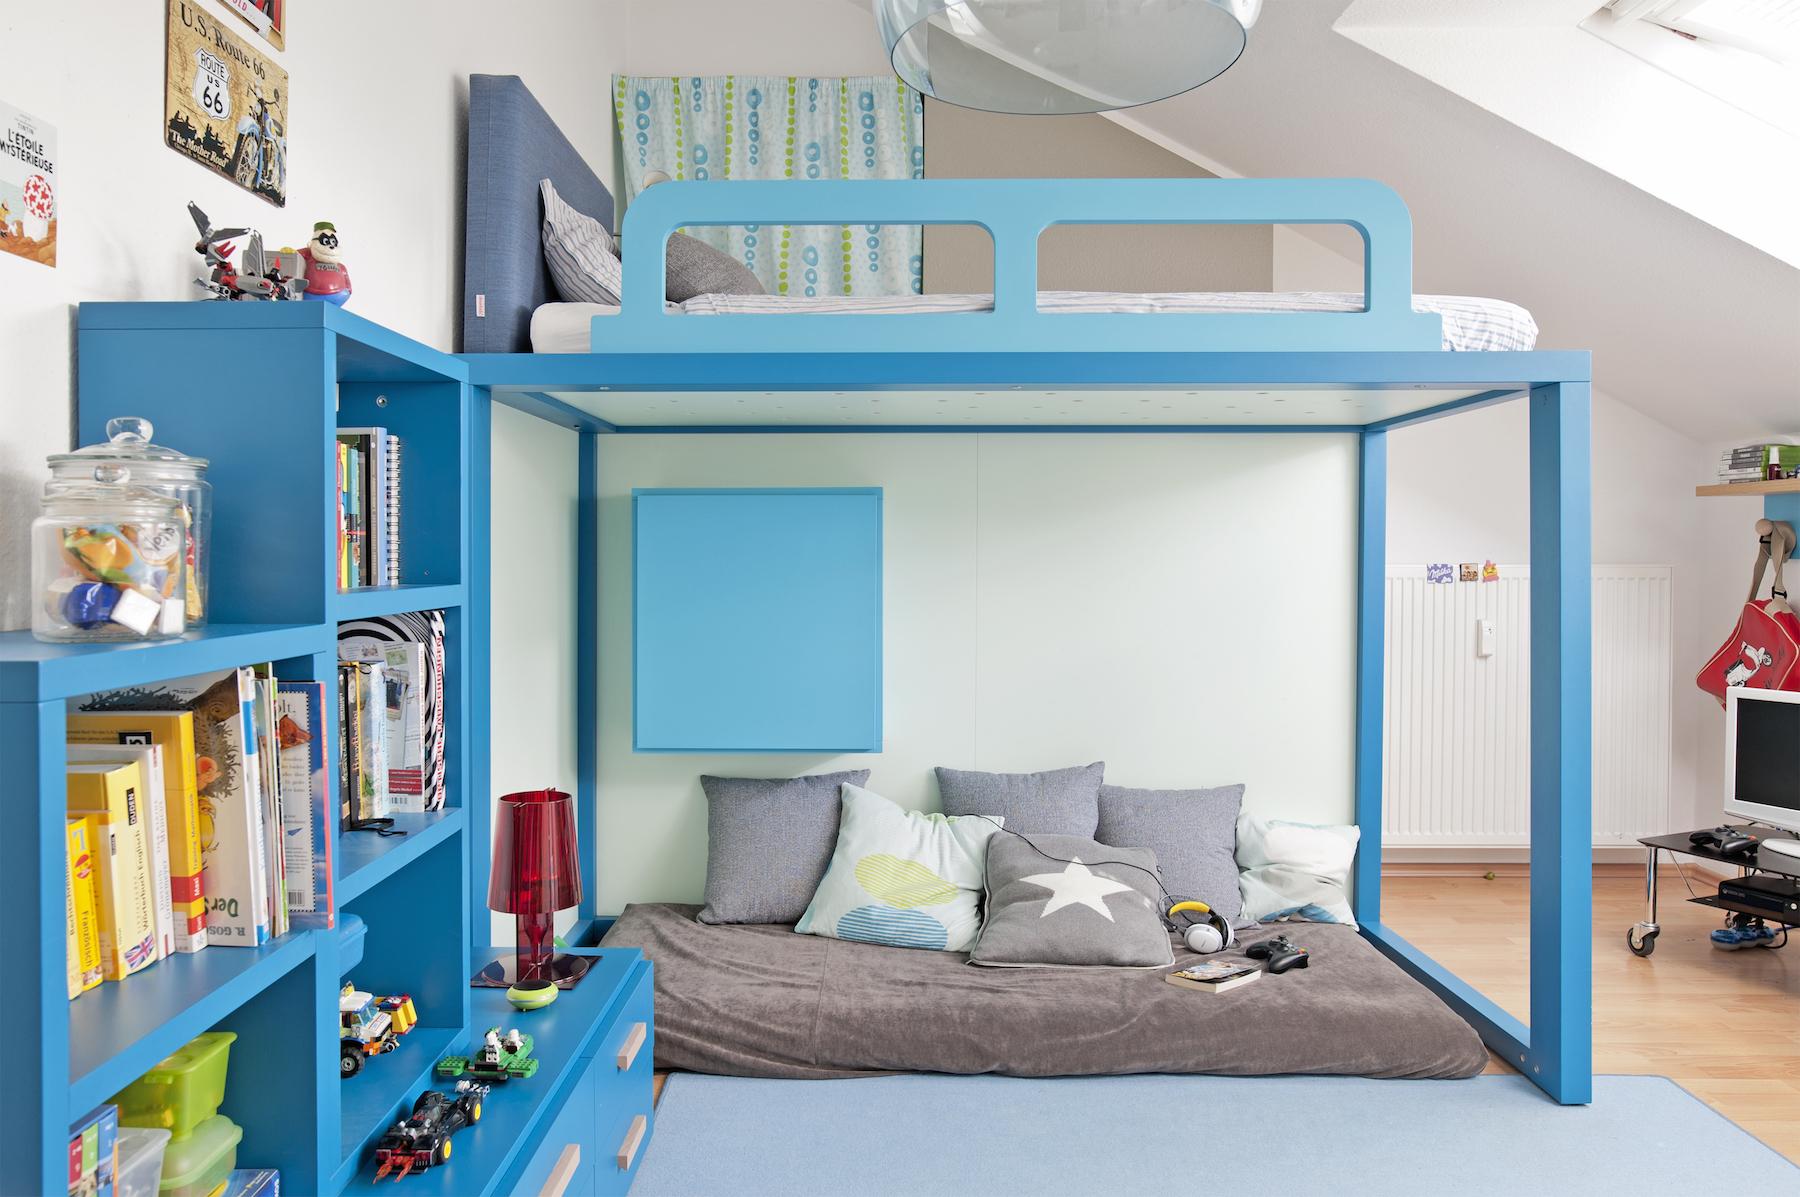 Full Size of Kinderzimmer Jungs Ikea Ideen 10 Jahre Gestalten 5 8 1000 Ideas About Babyzimmer On Pinterest Regal Weiß Sofa Regale Kinderzimmer Kinderzimmer Jungs